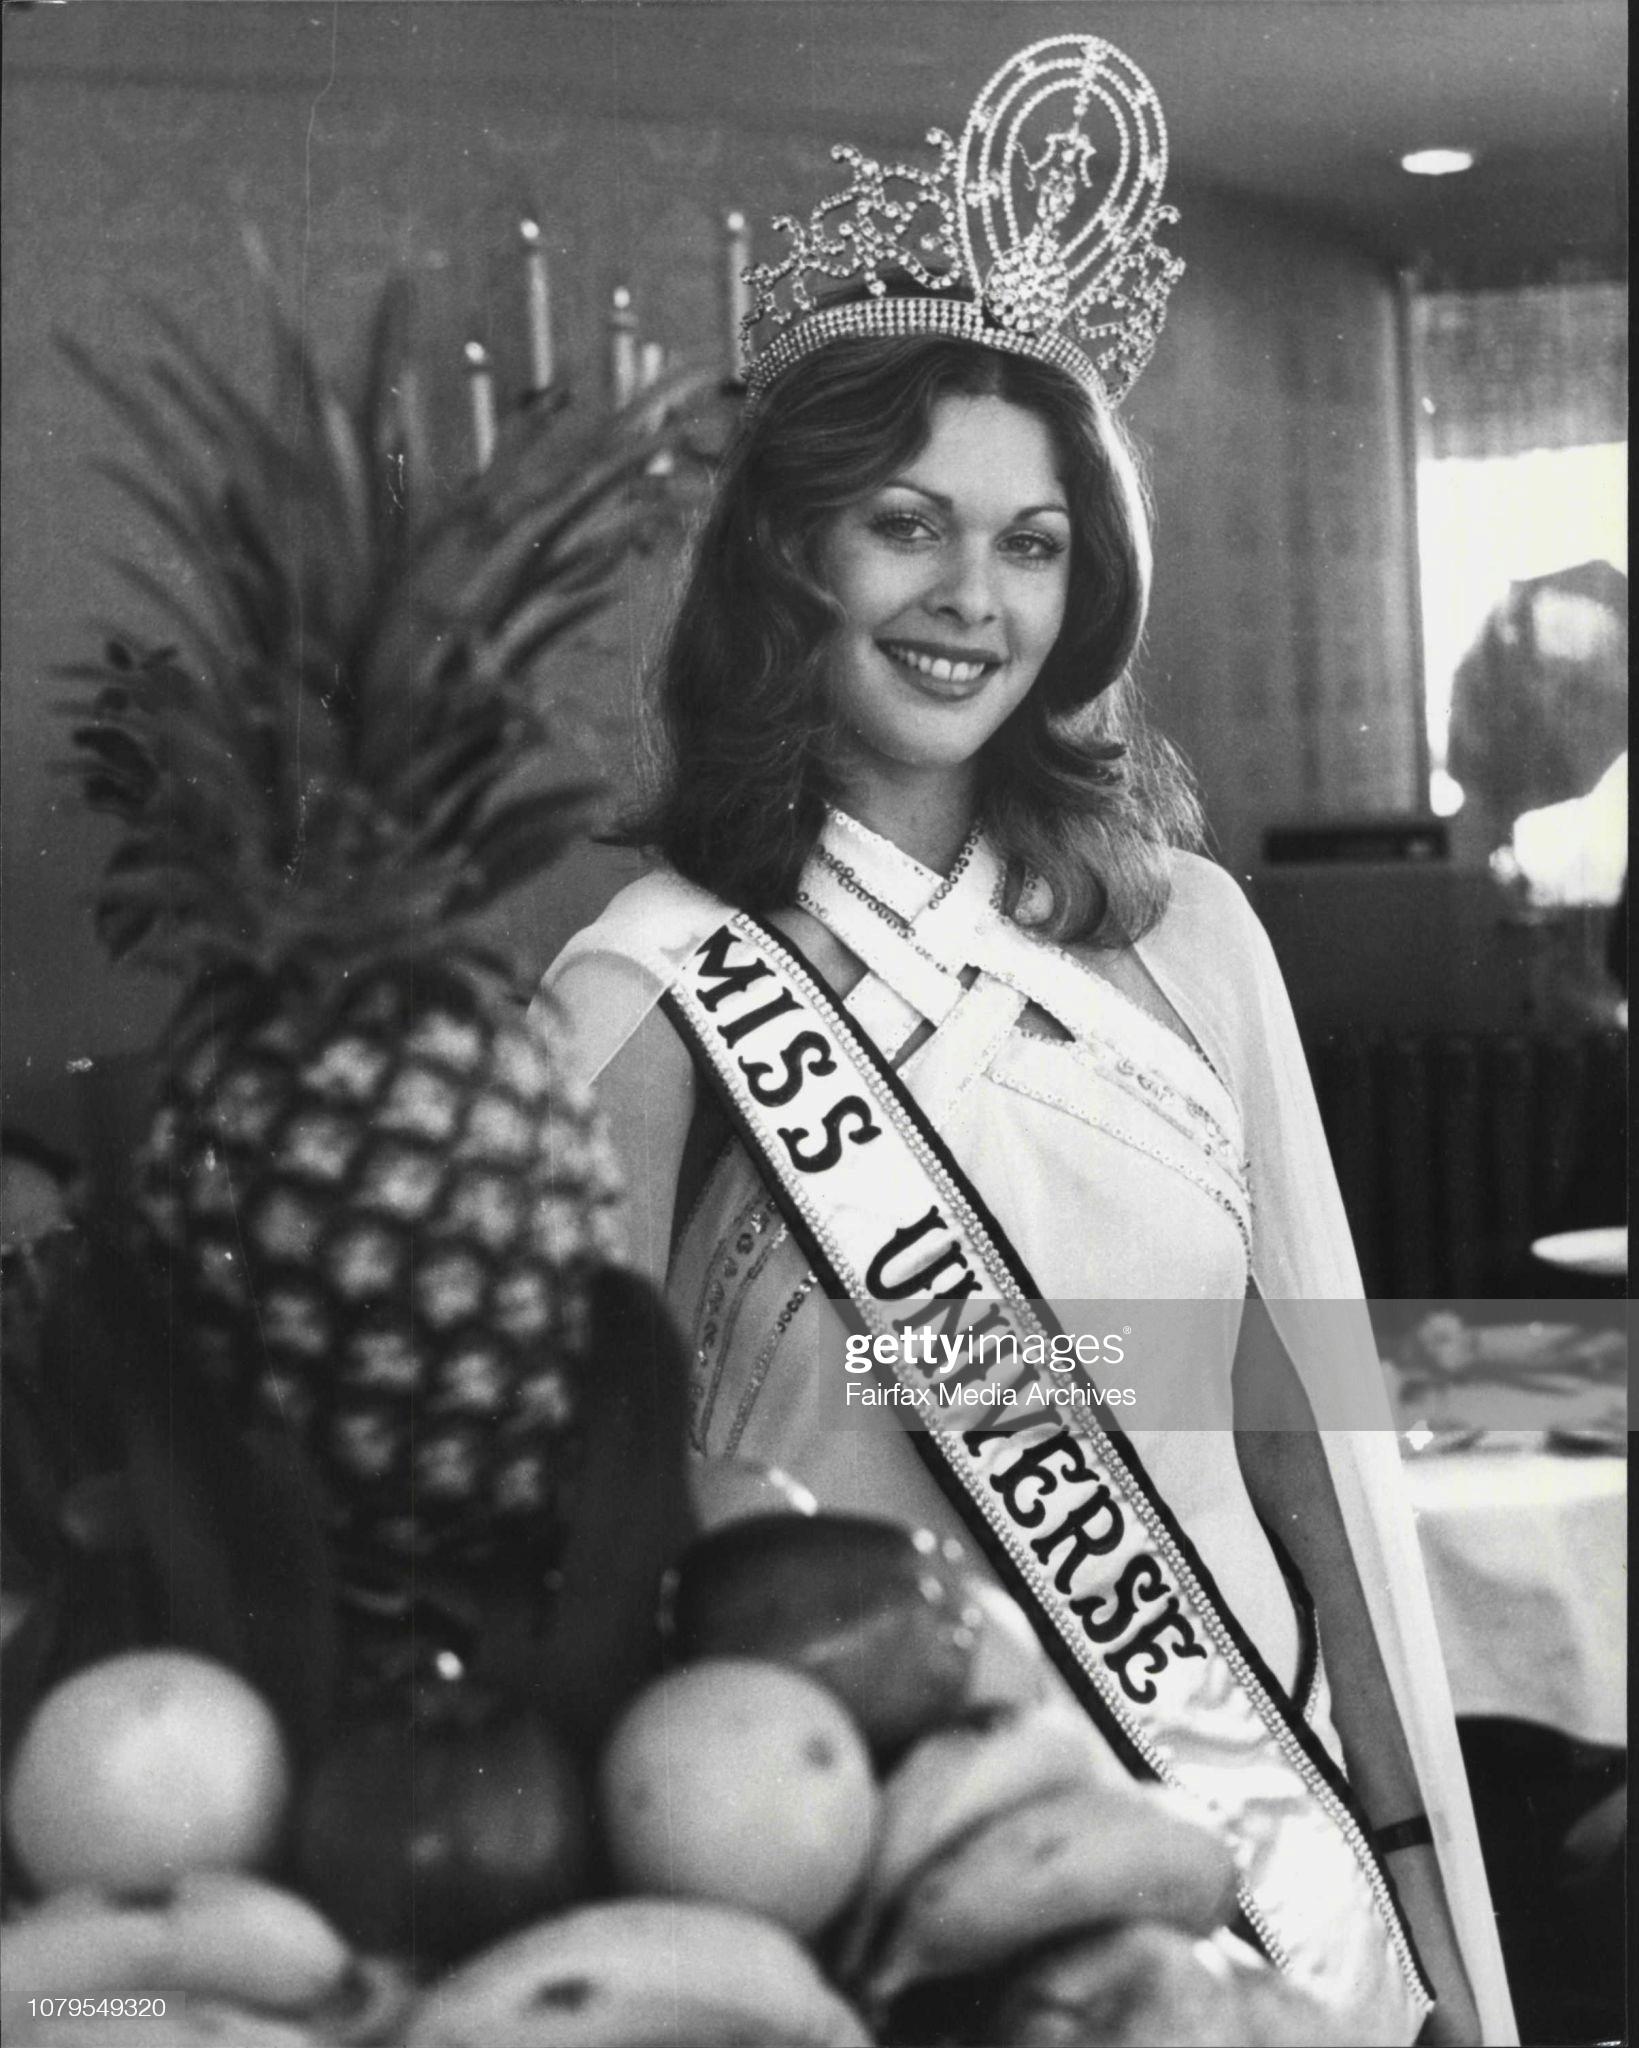 rina messinger, miss universe 1976. 23321510